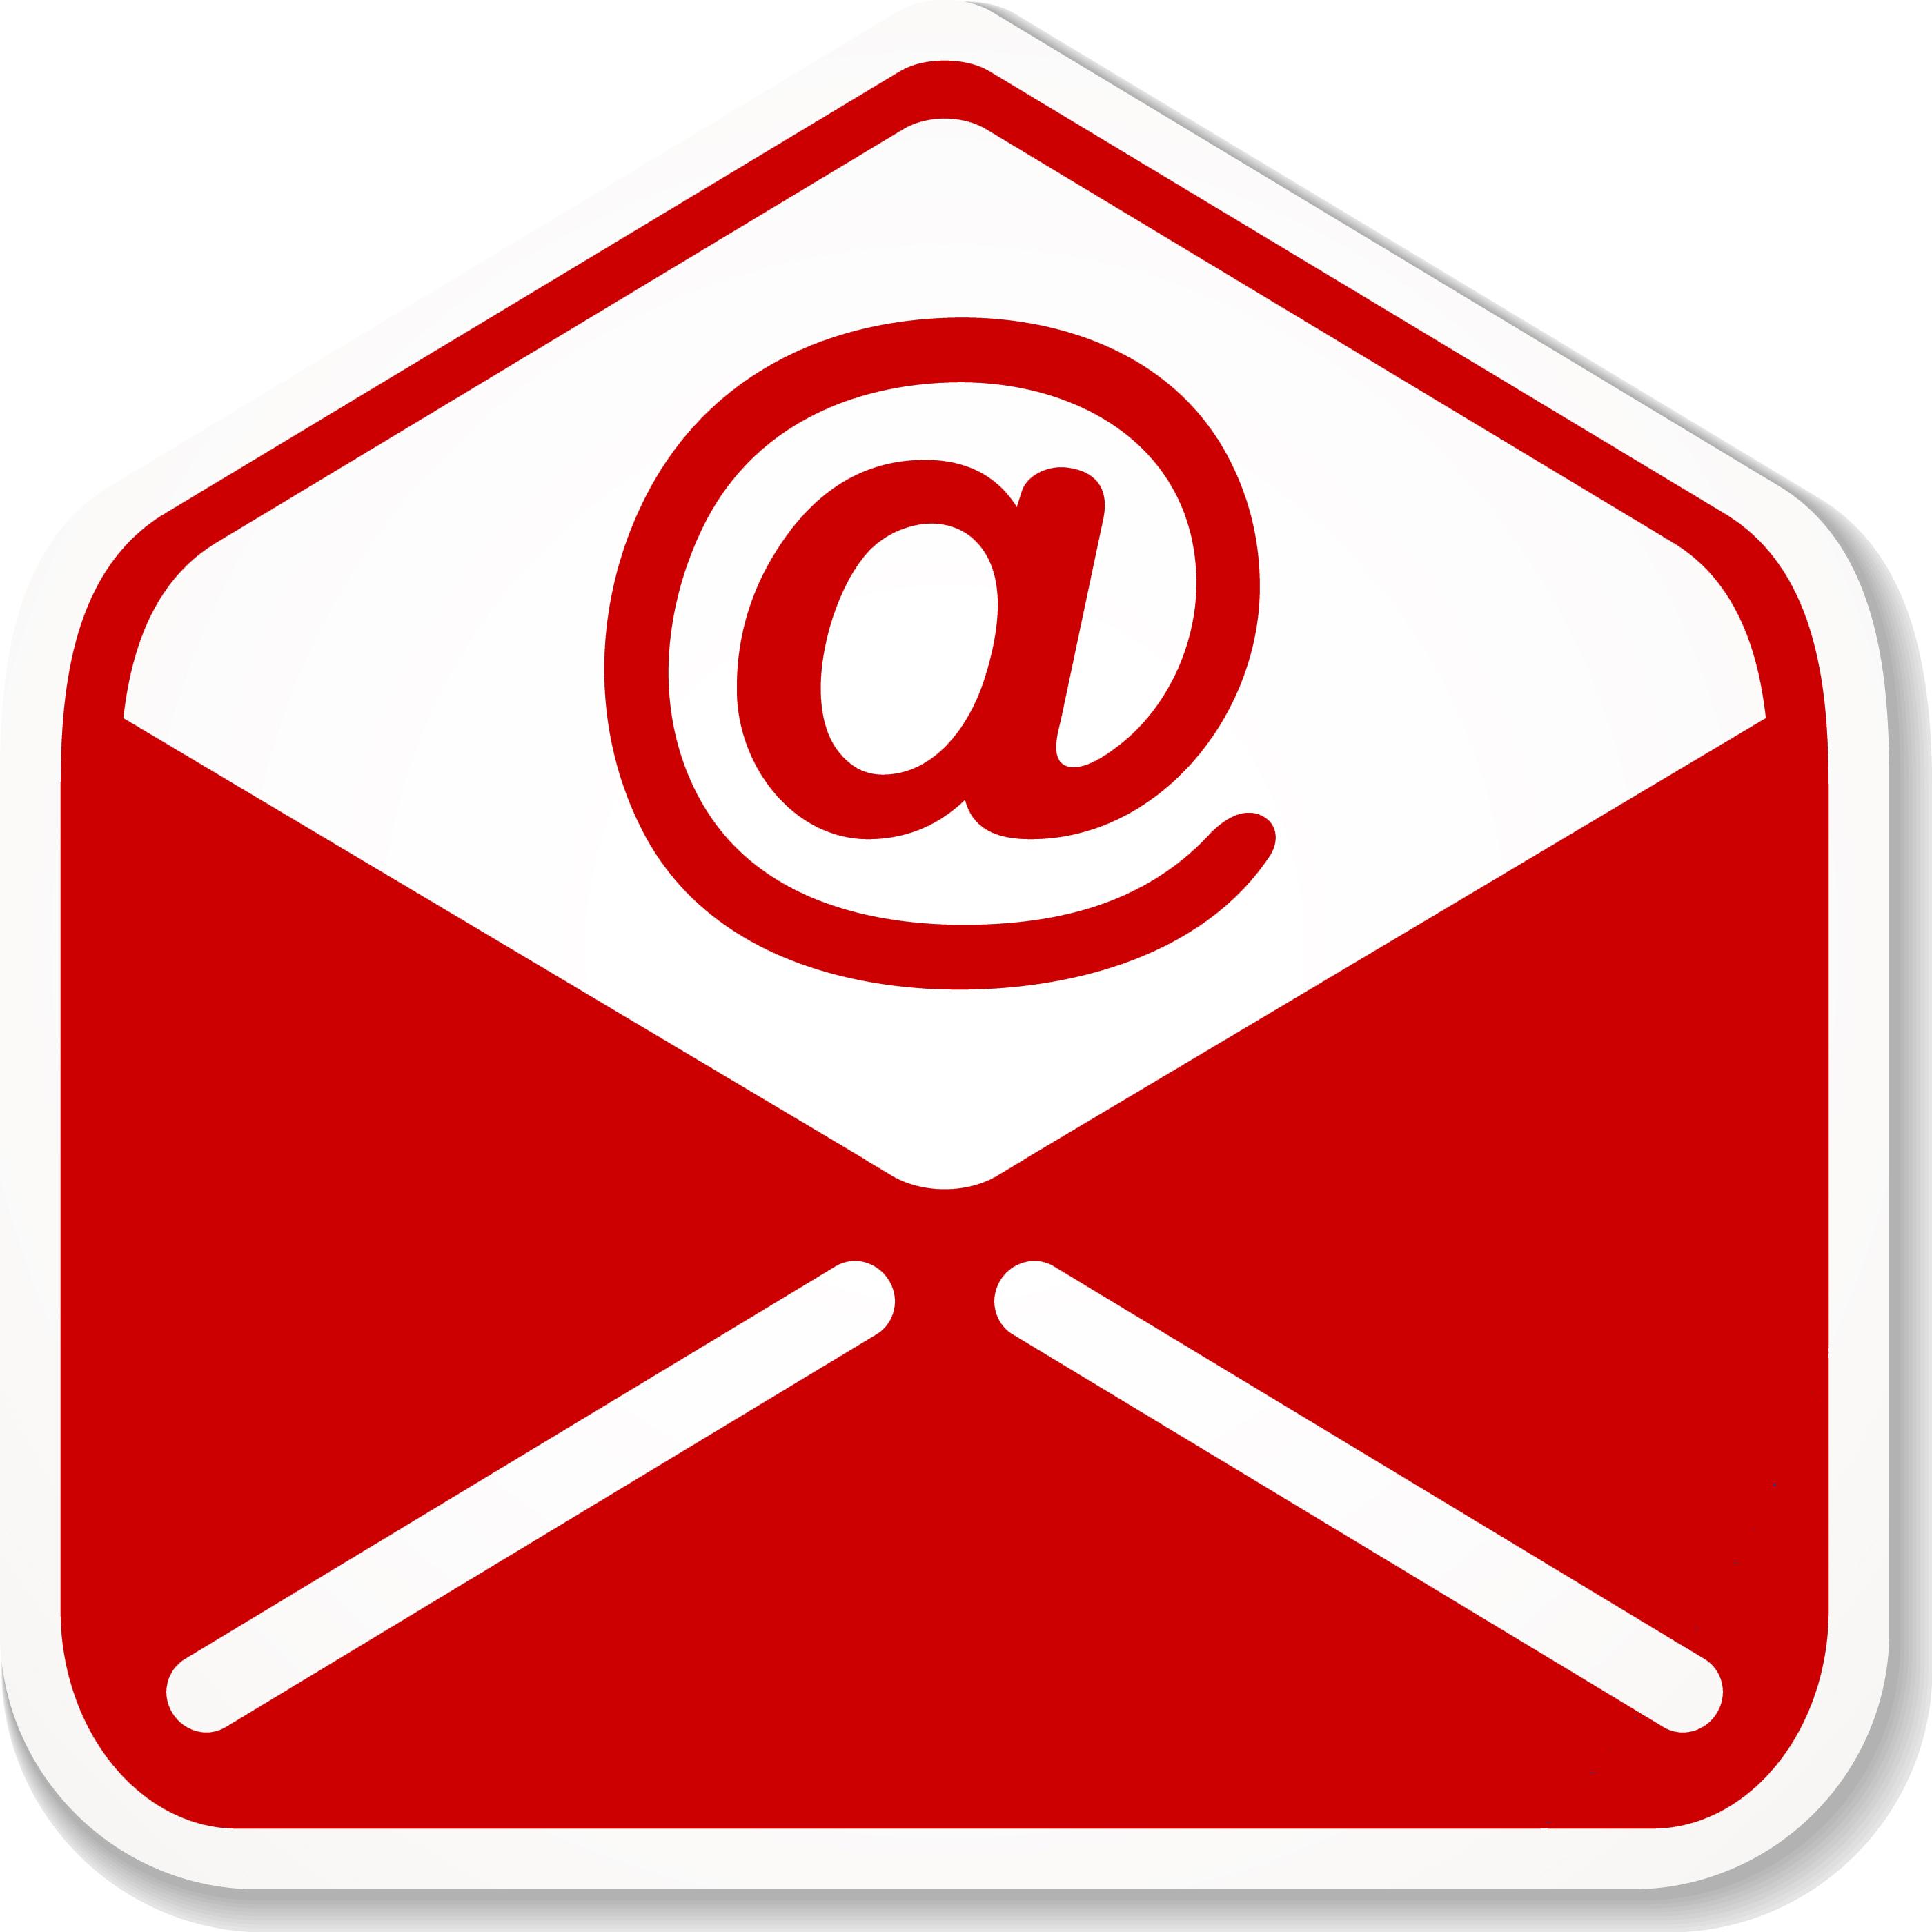 http://homecatalogueshoppinginc.tripod.com/webonmediacontents/email%20logo.jpeg